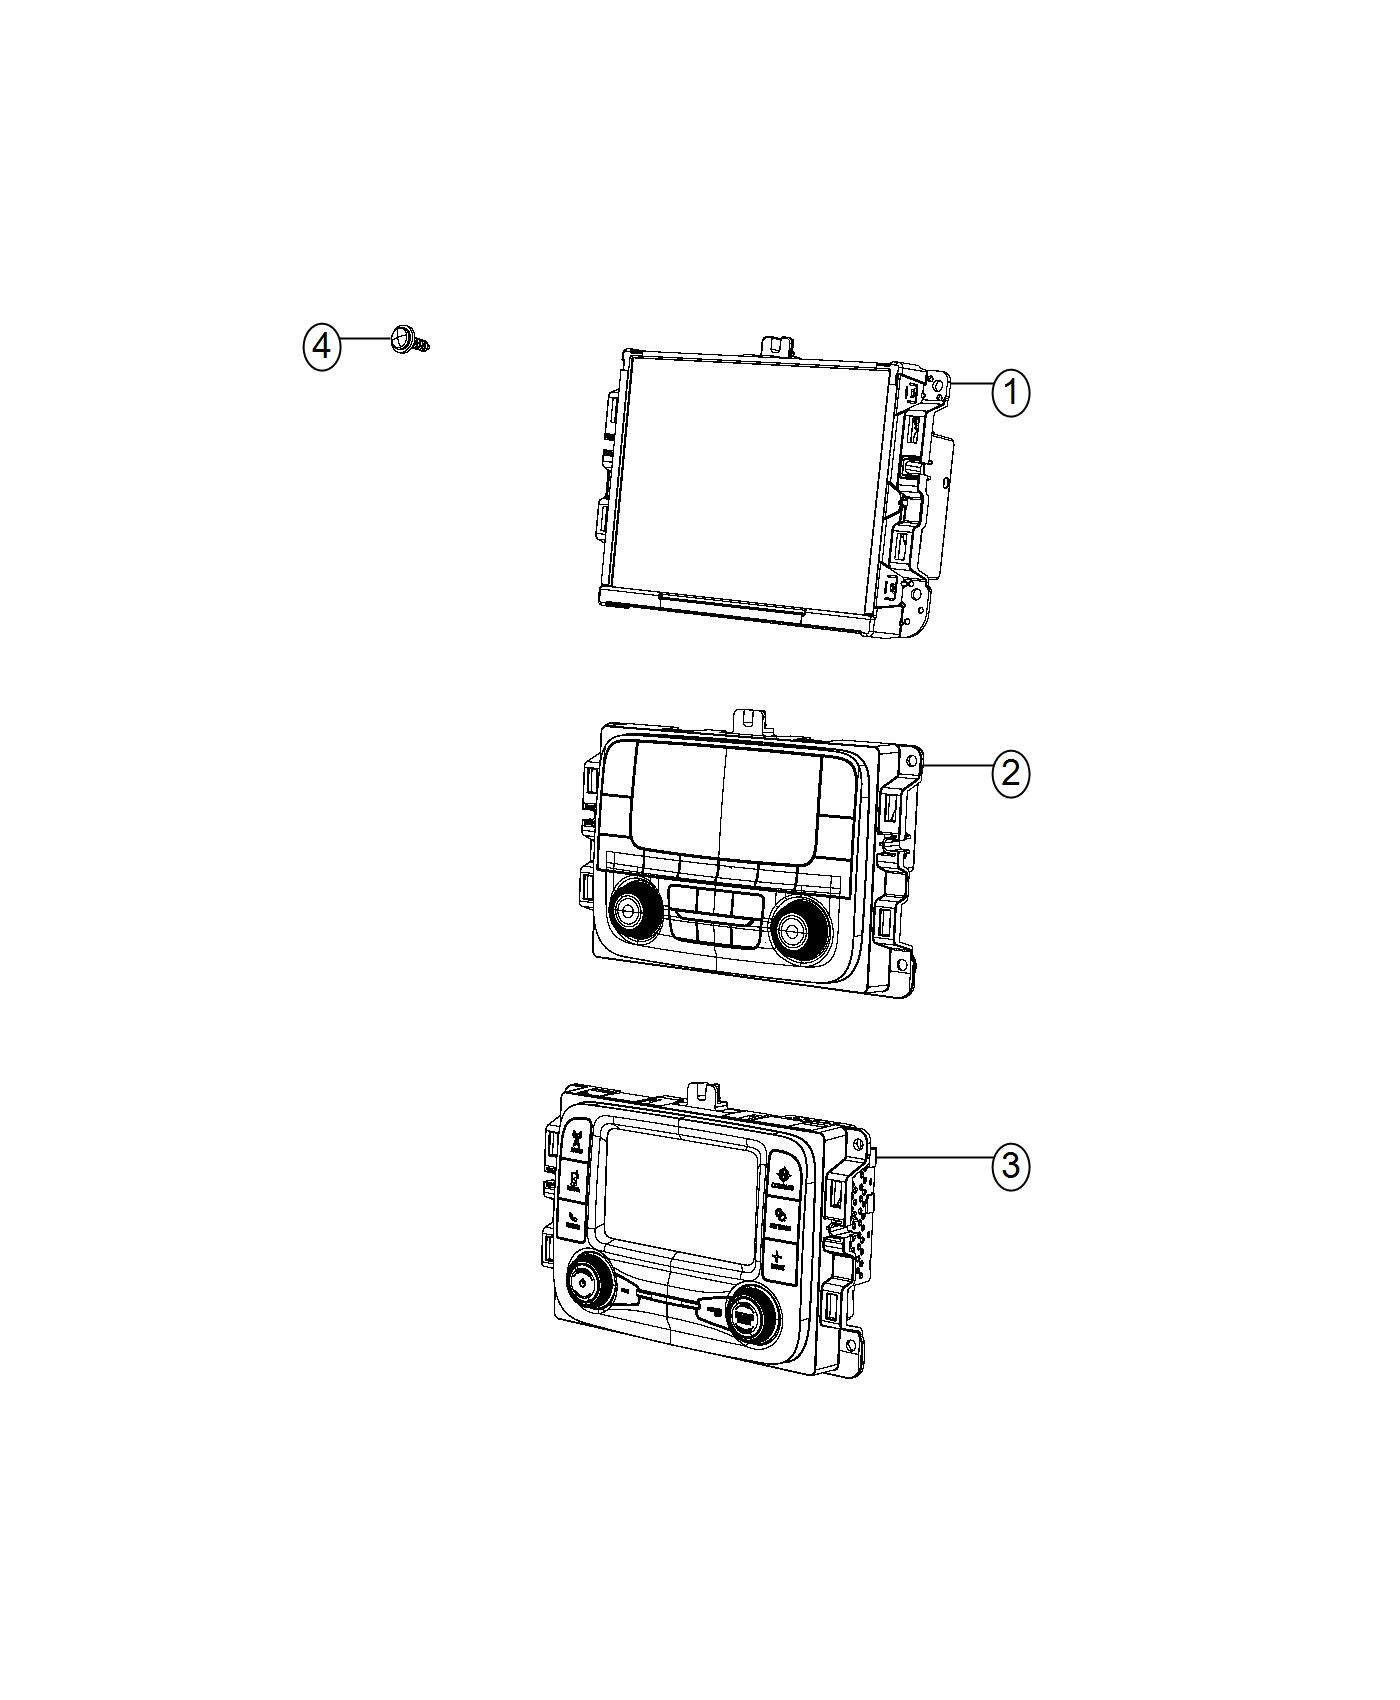 Jeep Renegade Radio Multi Media Instrument Panel Parts